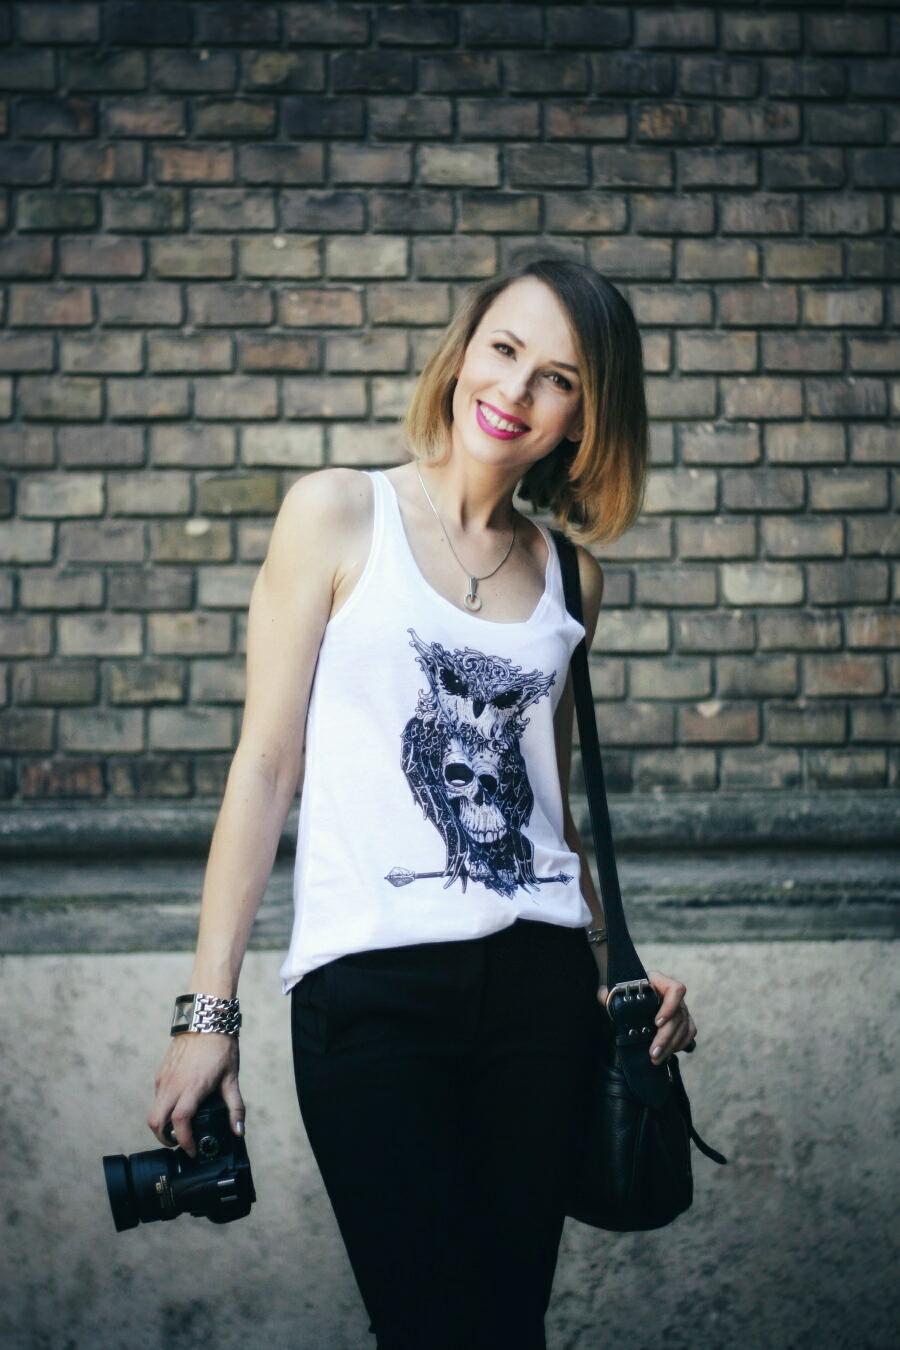 rockgirl_skull_thsirt